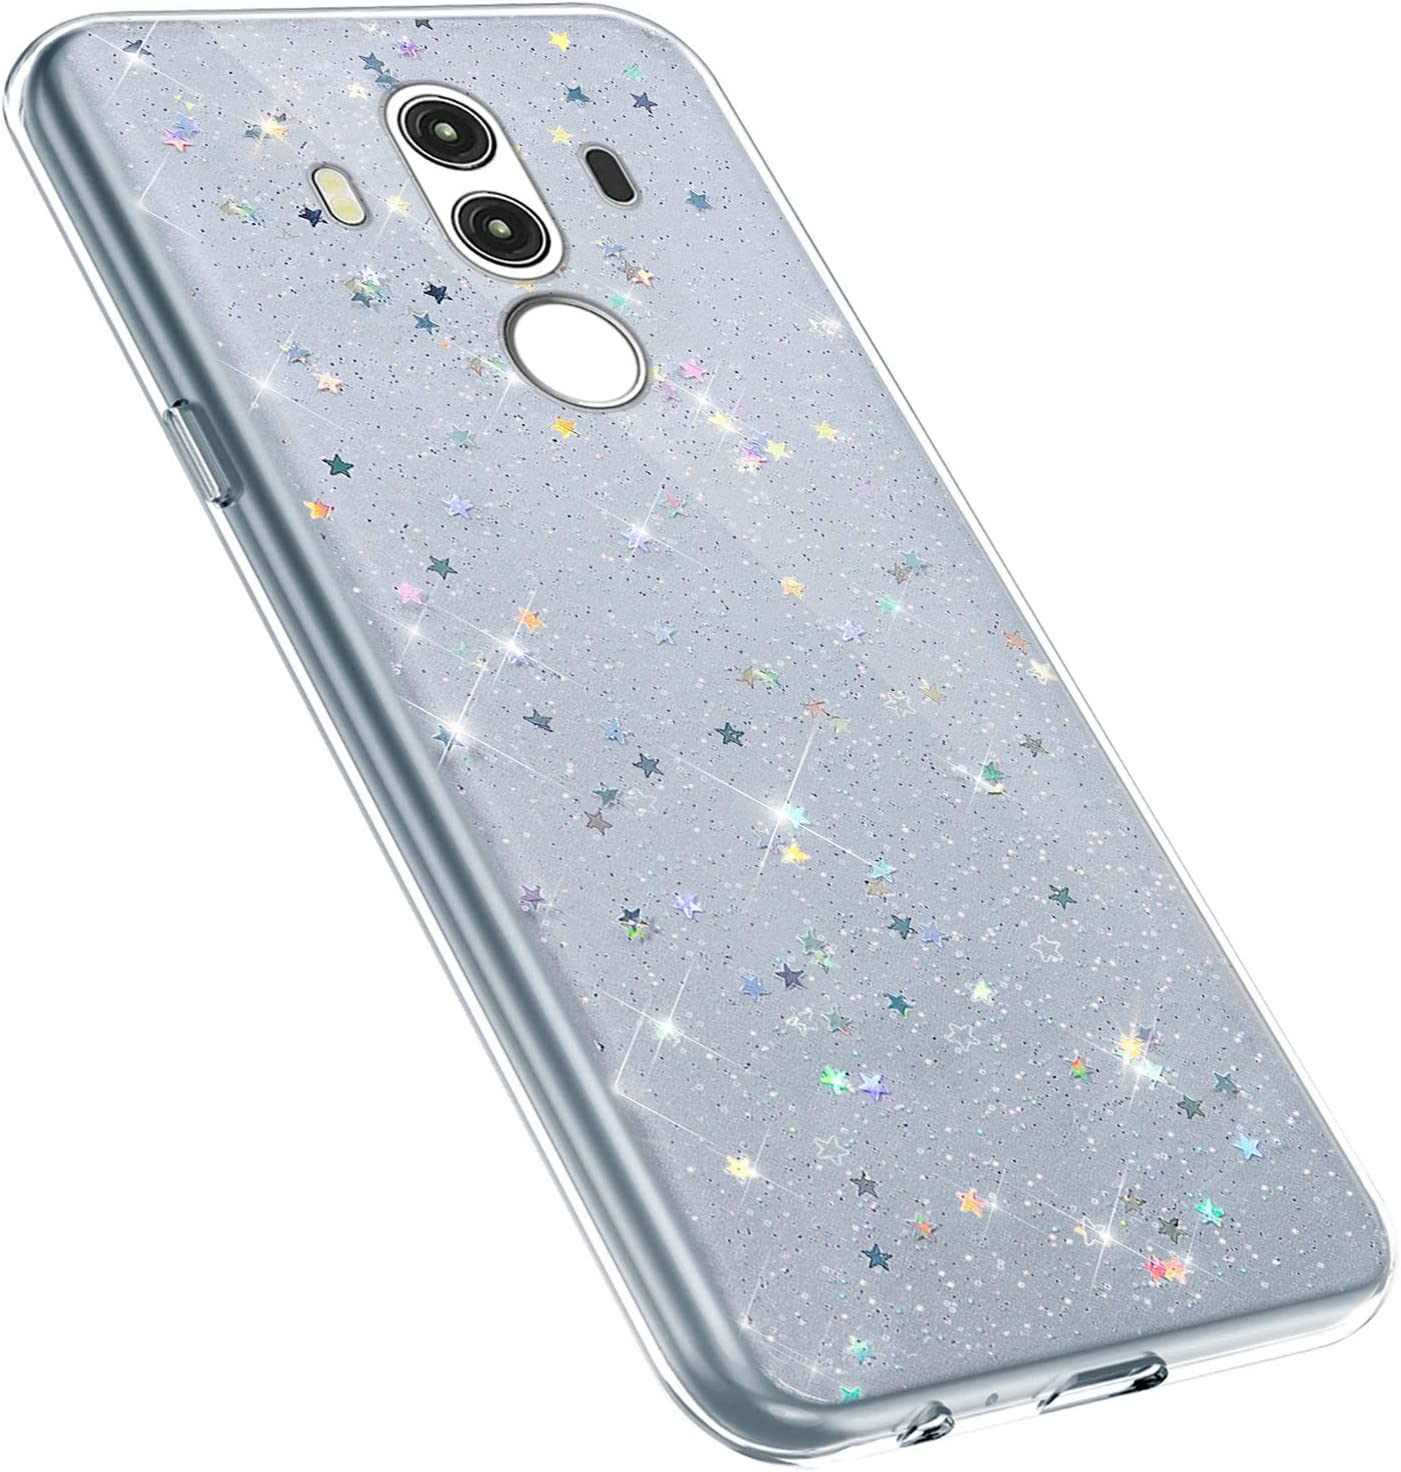 MoreChioce kompatibel mit Huawei Mate 10 Pro H/ülle,kompatibel mit Huawei Mate 10 Pro Glitzer Handyh/ülle,Kreativ Durchsichtig Dot Bling Paillette Strass Silikonh/ülle Schutzh/ülle Flexible Bumper